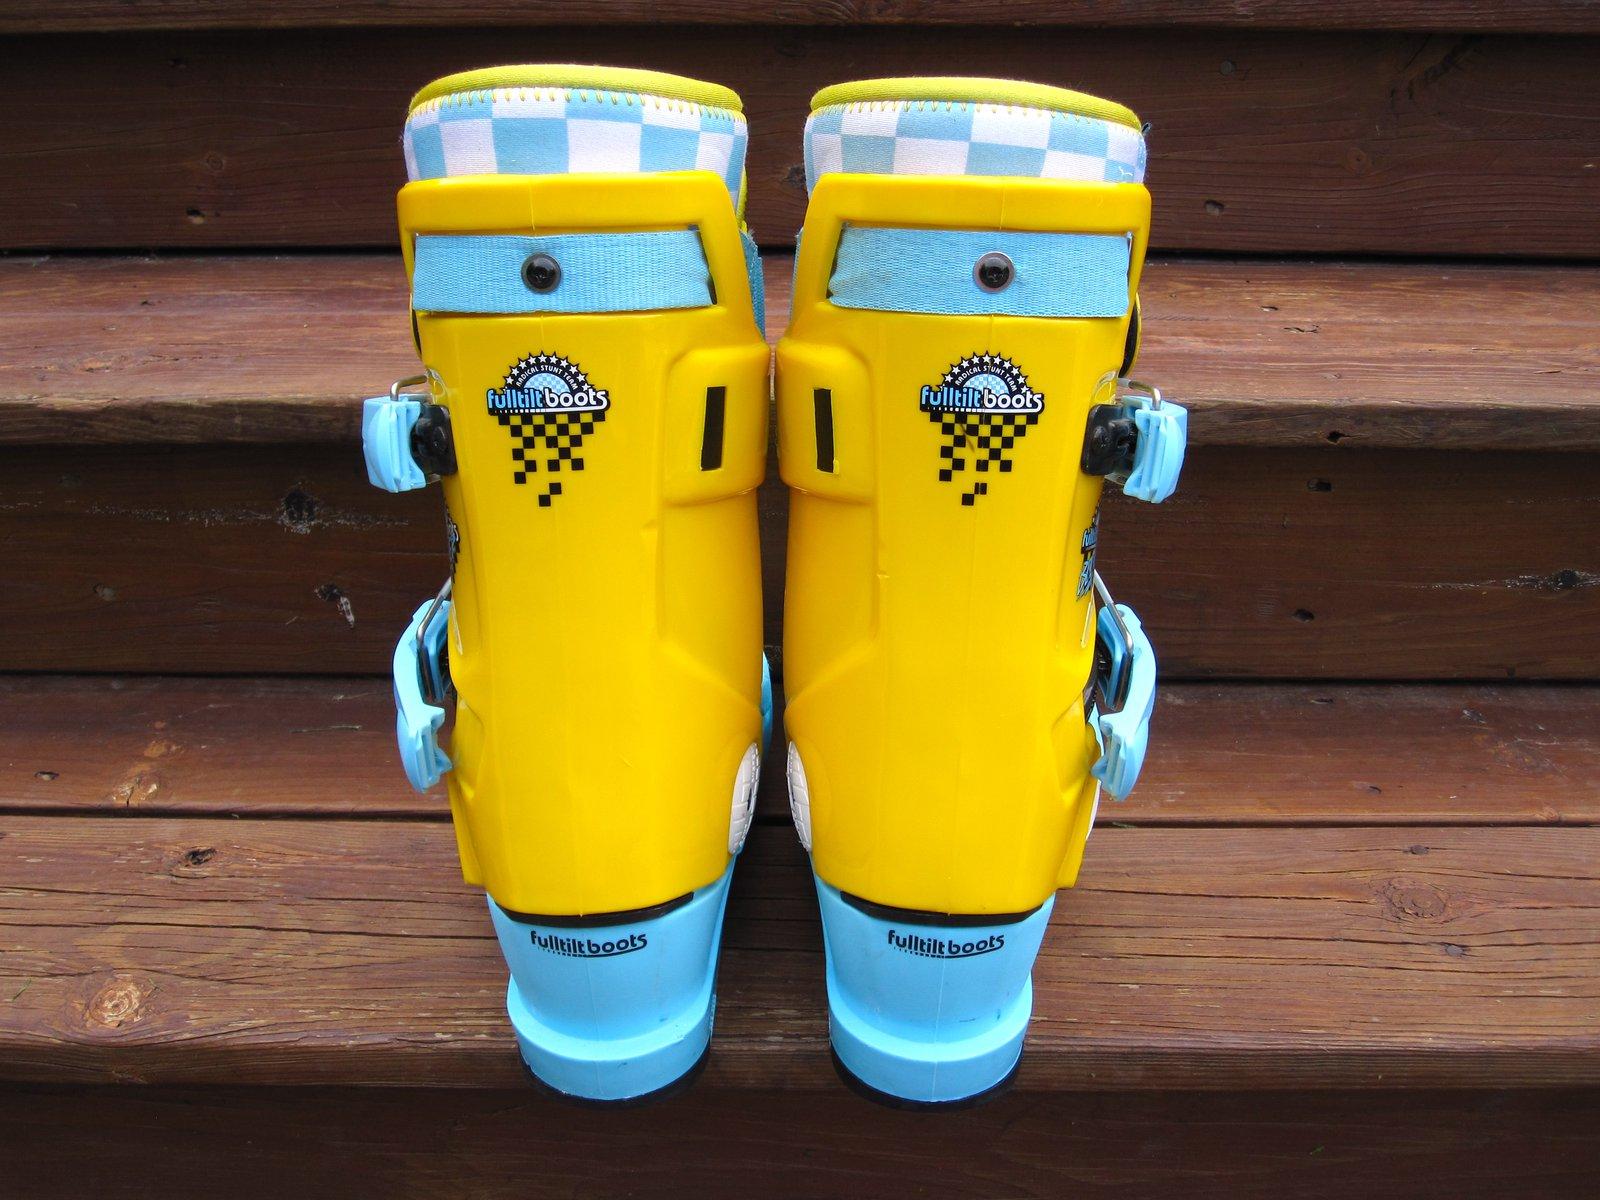 Fulltilt booters size 26.5